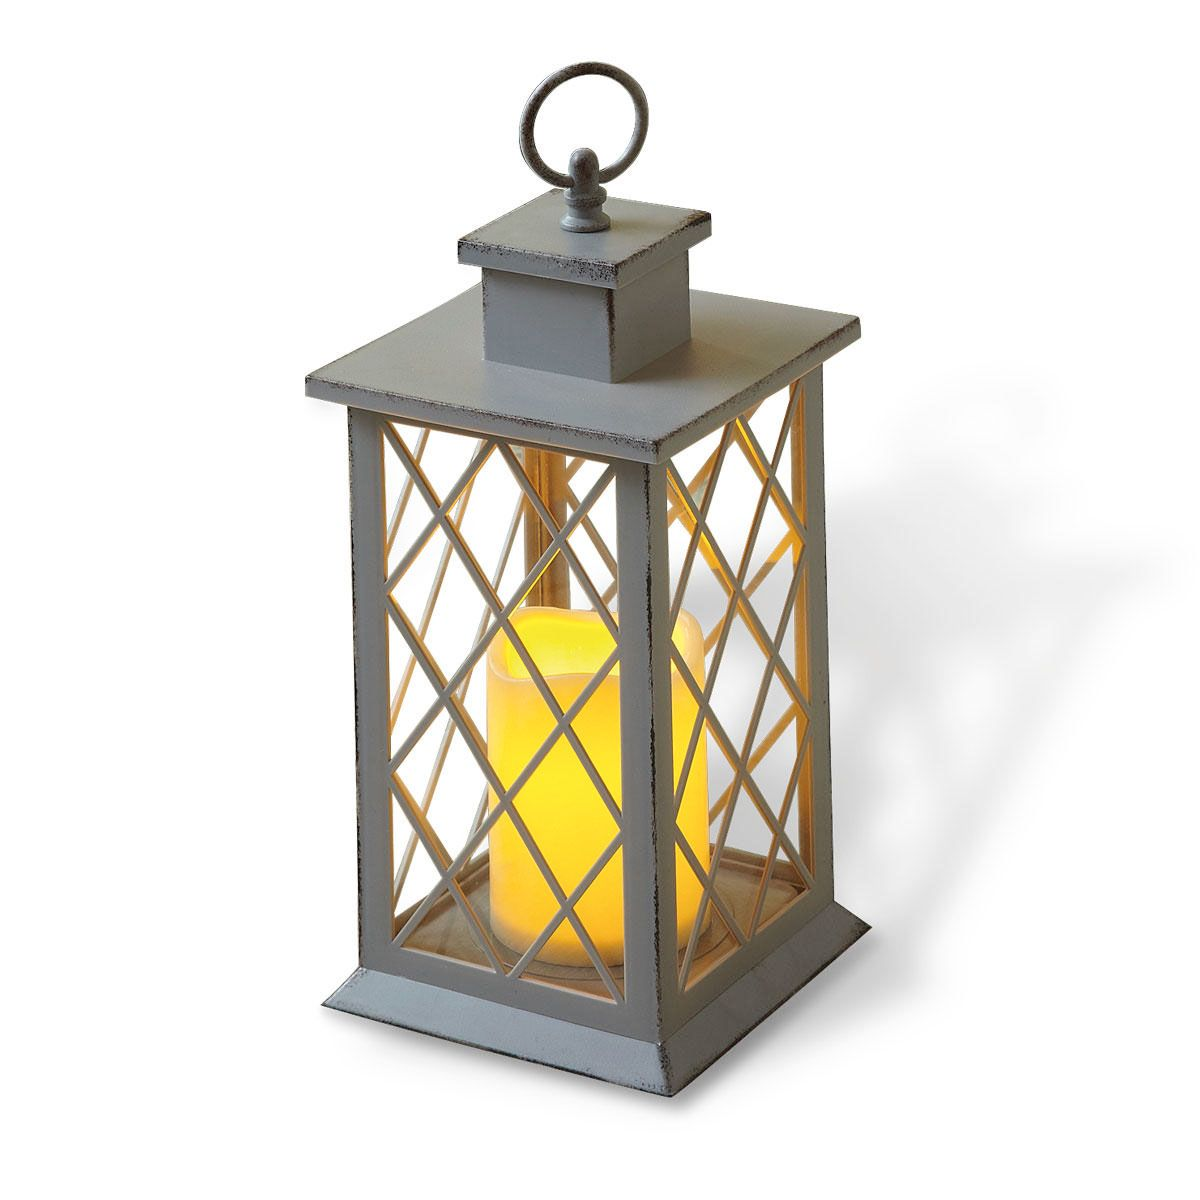 Light Grey LED Lantern with Cross Window